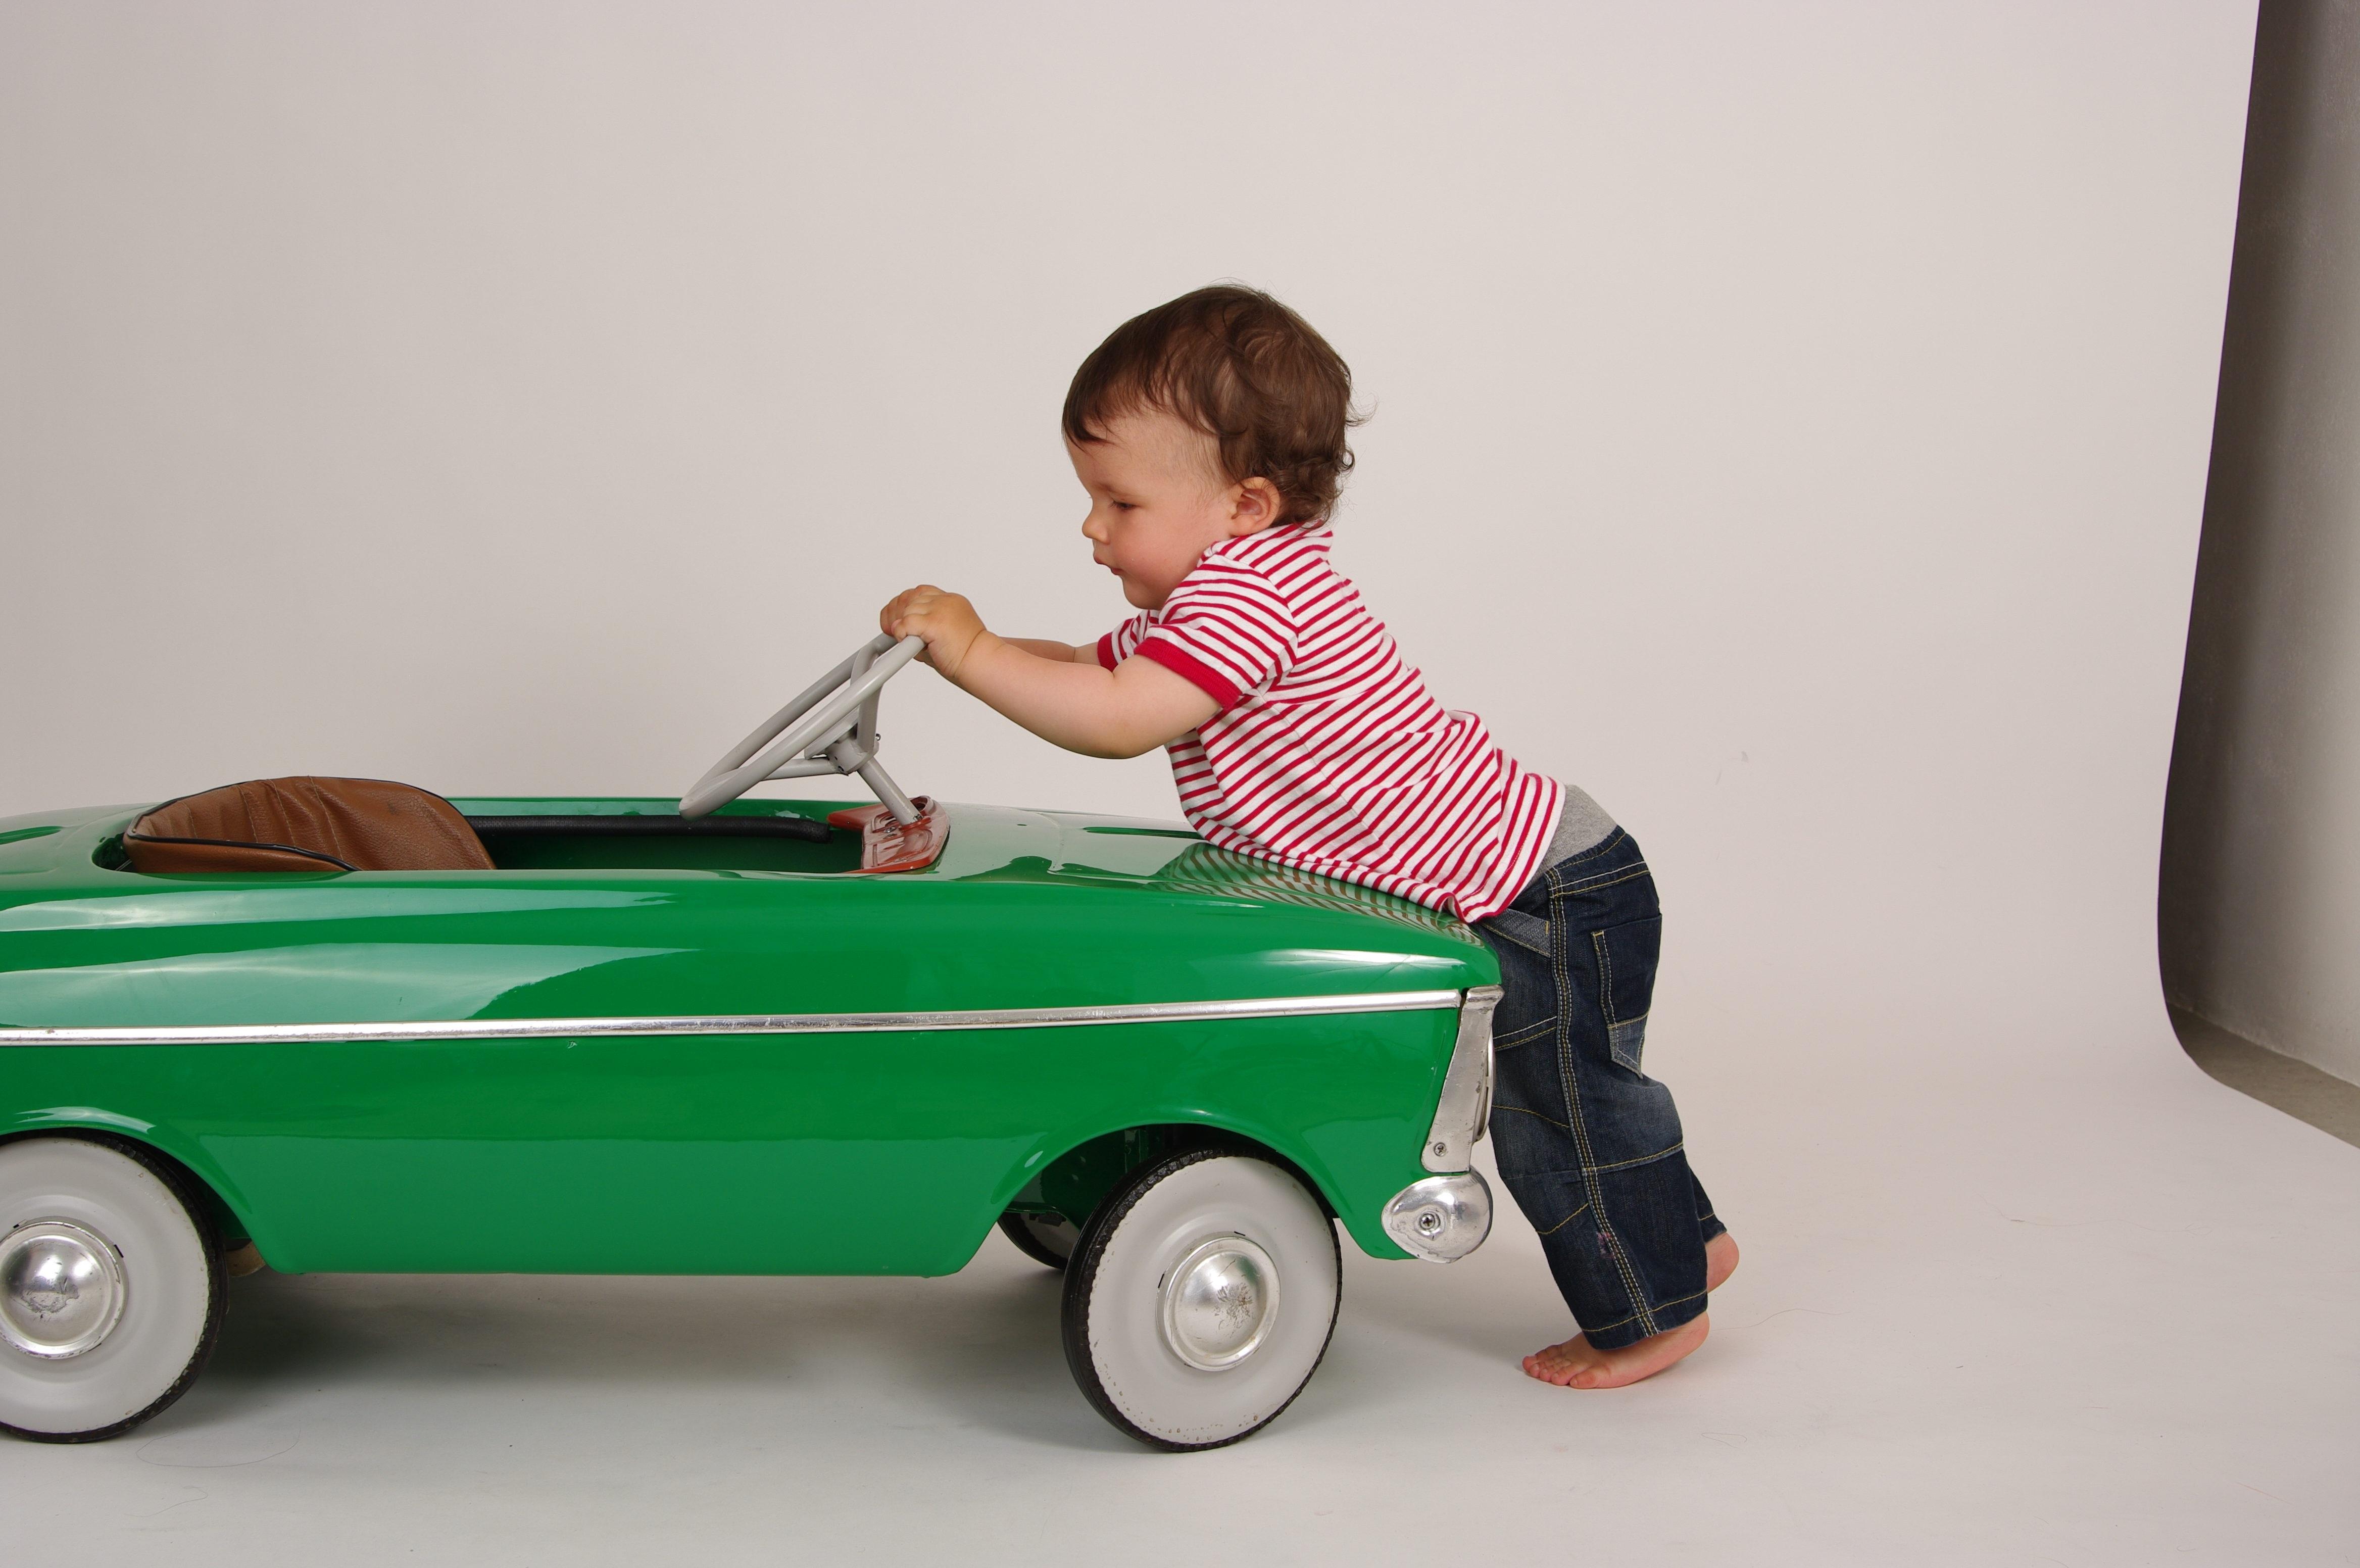 images gratuites chariot gar on v hicule enfant jouet b b produit pousser voiture. Black Bedroom Furniture Sets. Home Design Ideas